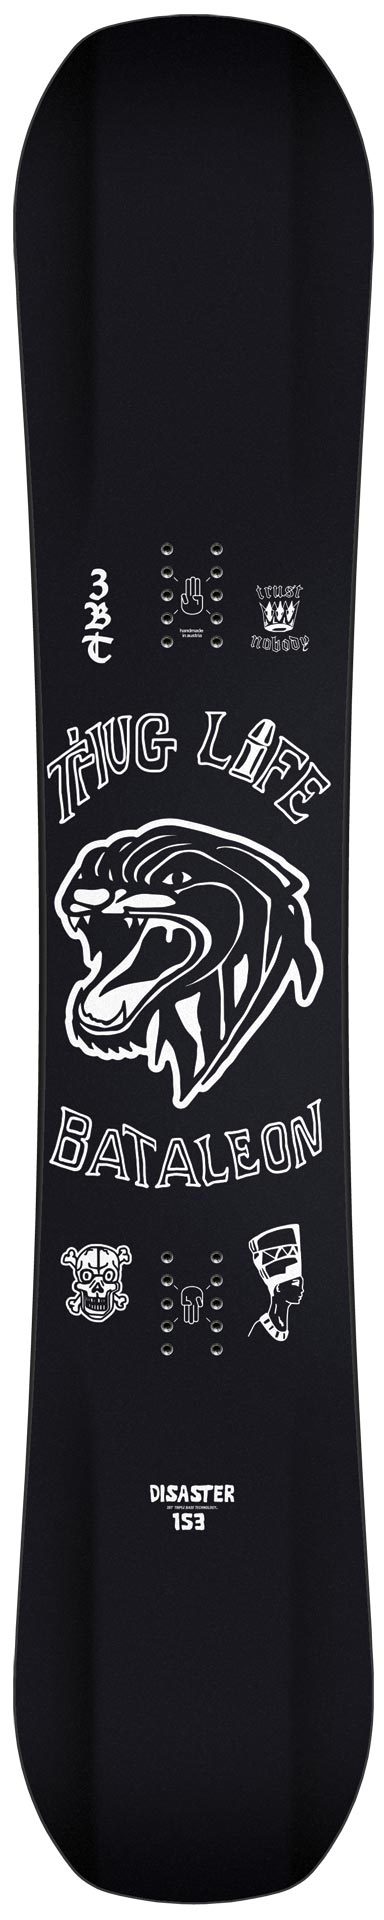 Bataleon: Disaster